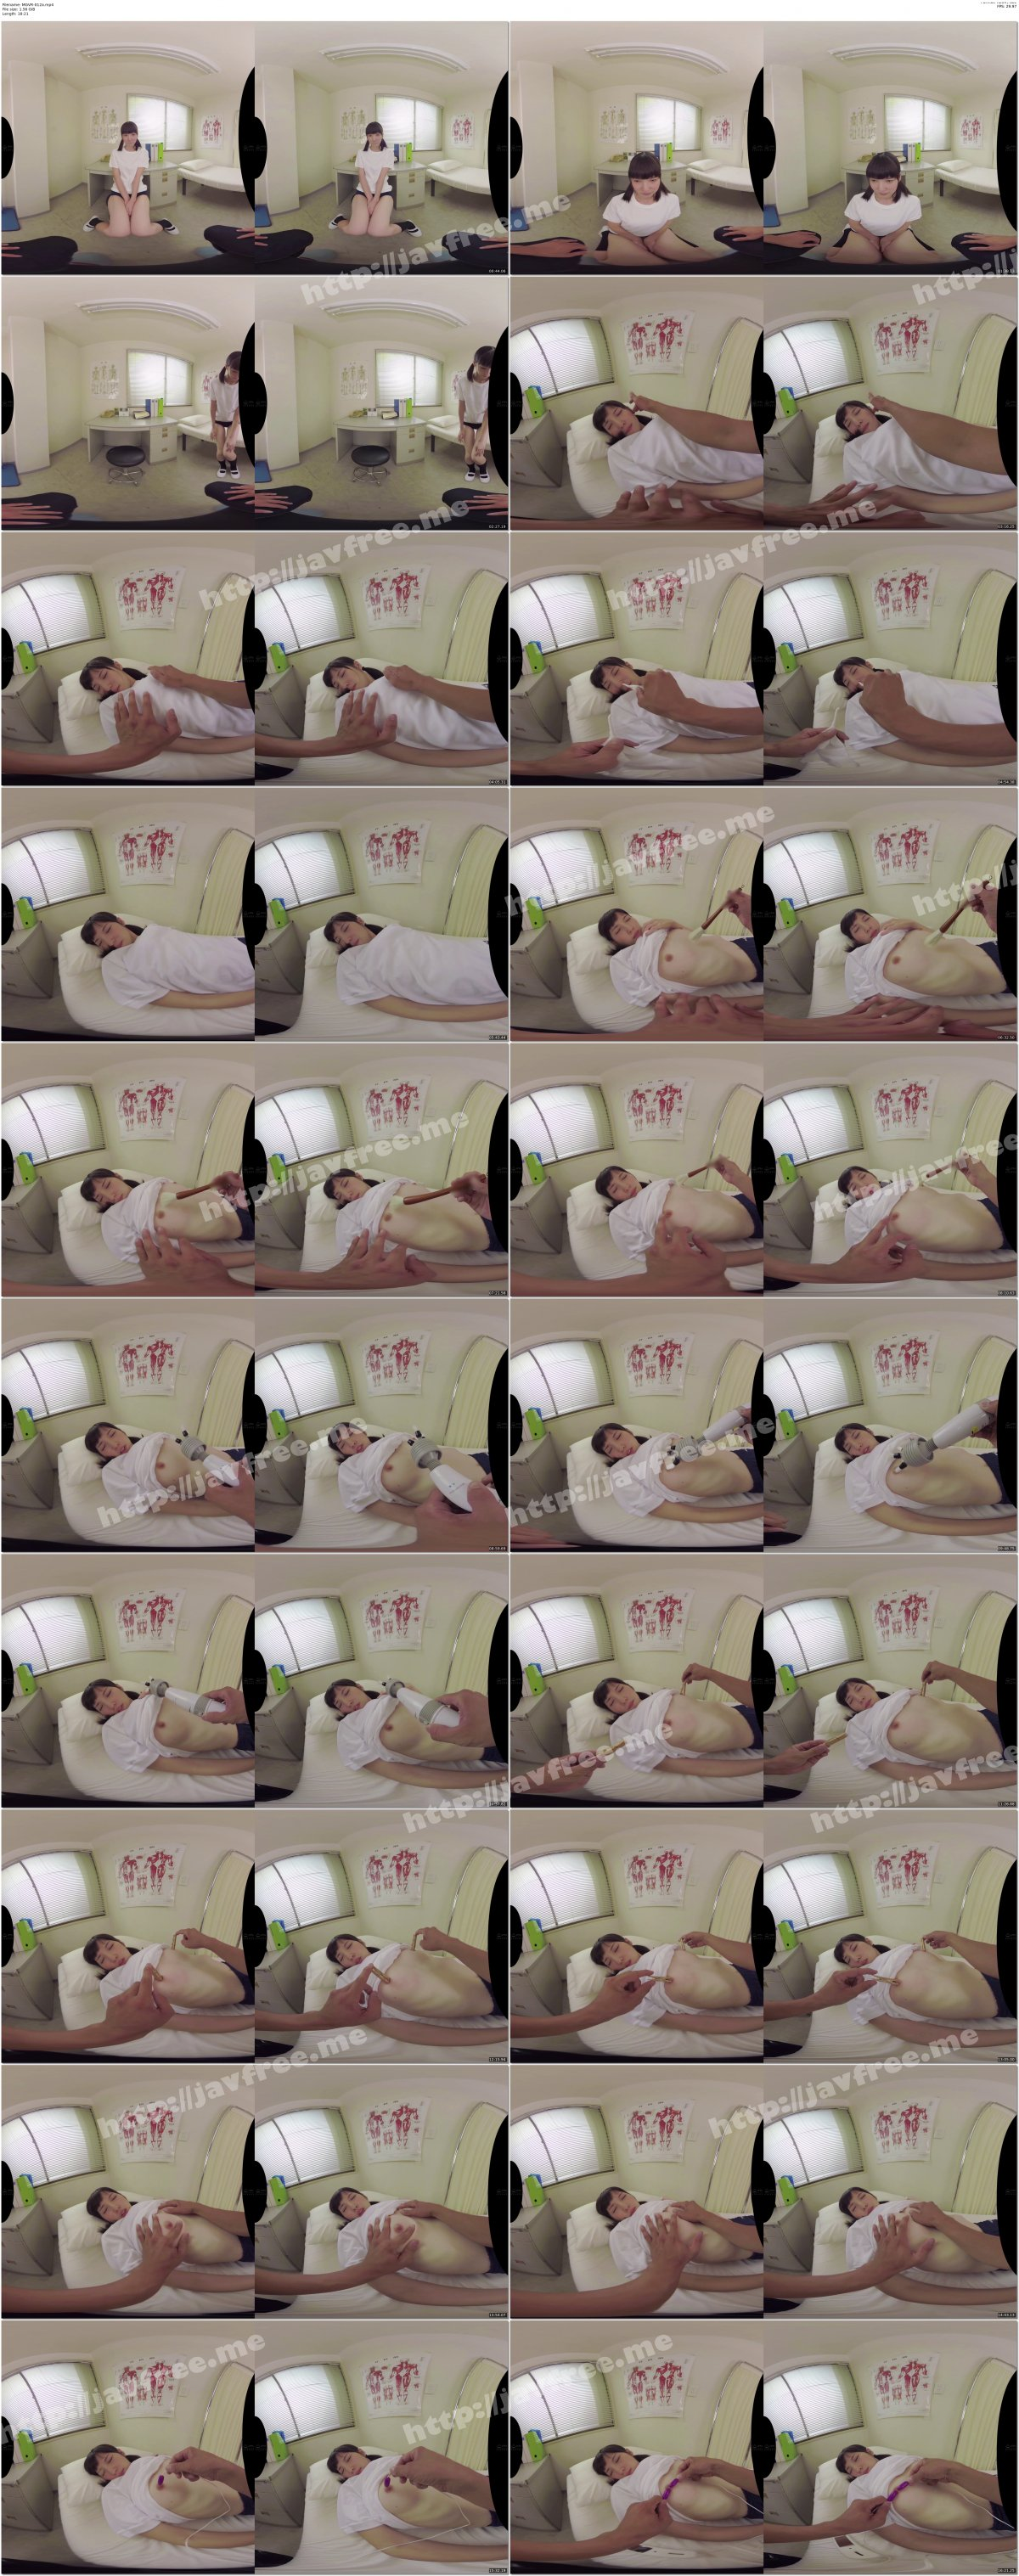 [MGVR-012] 【VR】寝たふり…できない女 水川えみる - image MGVR-012a on https://javfree.me